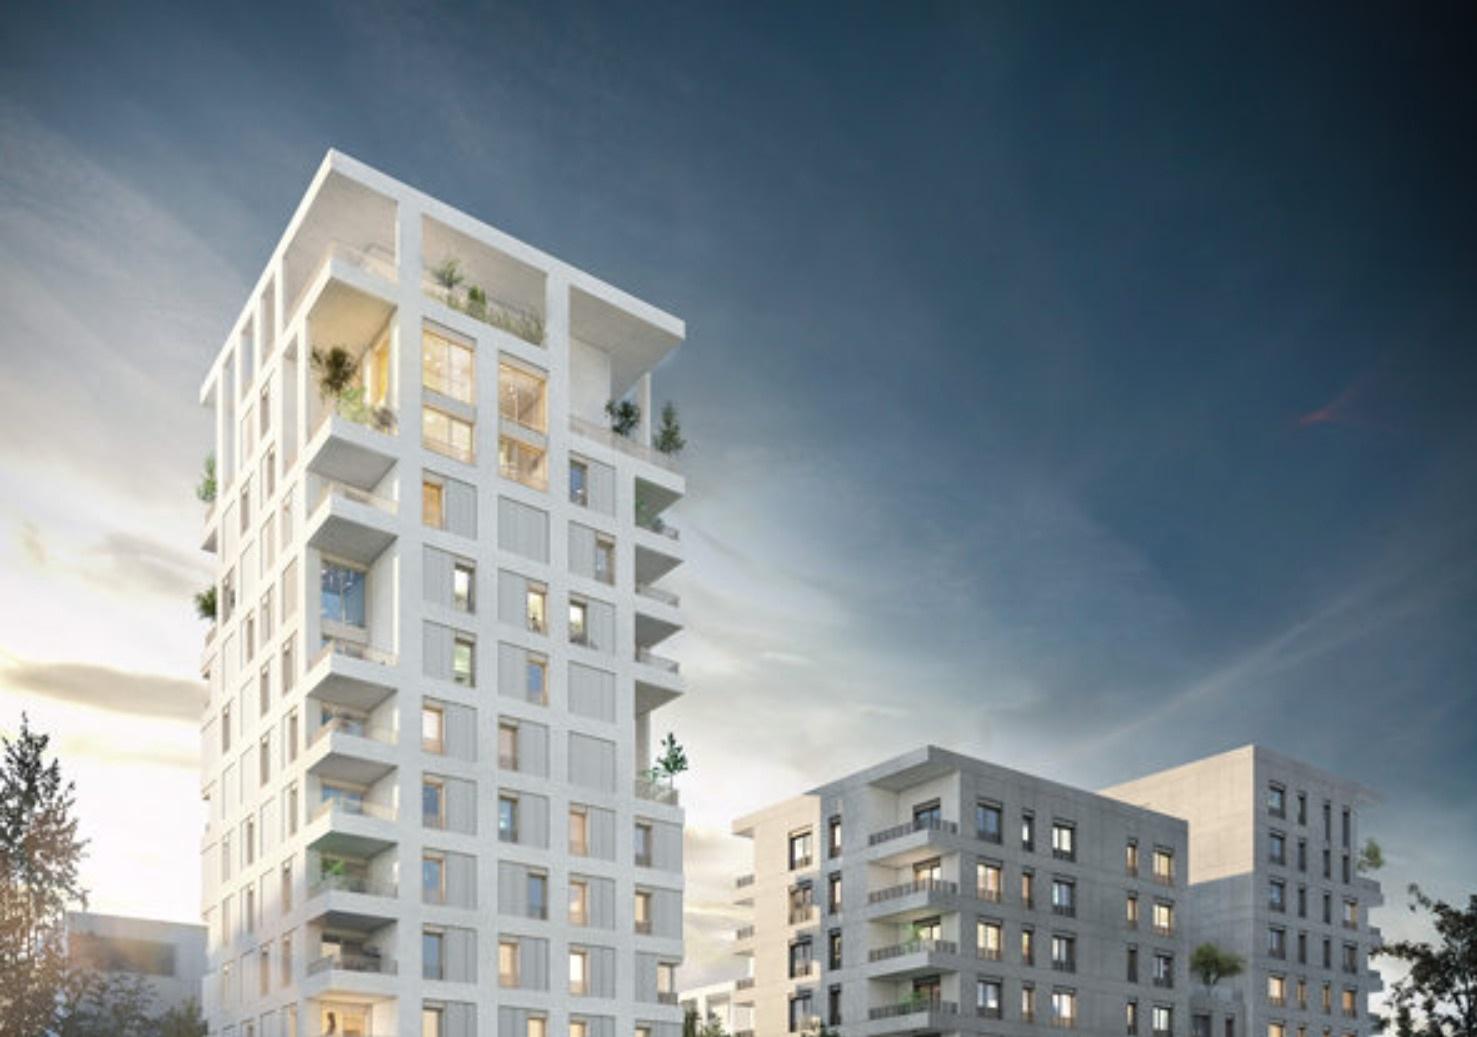 Programme immobilier Lyon 8ème (69008)  NAC2